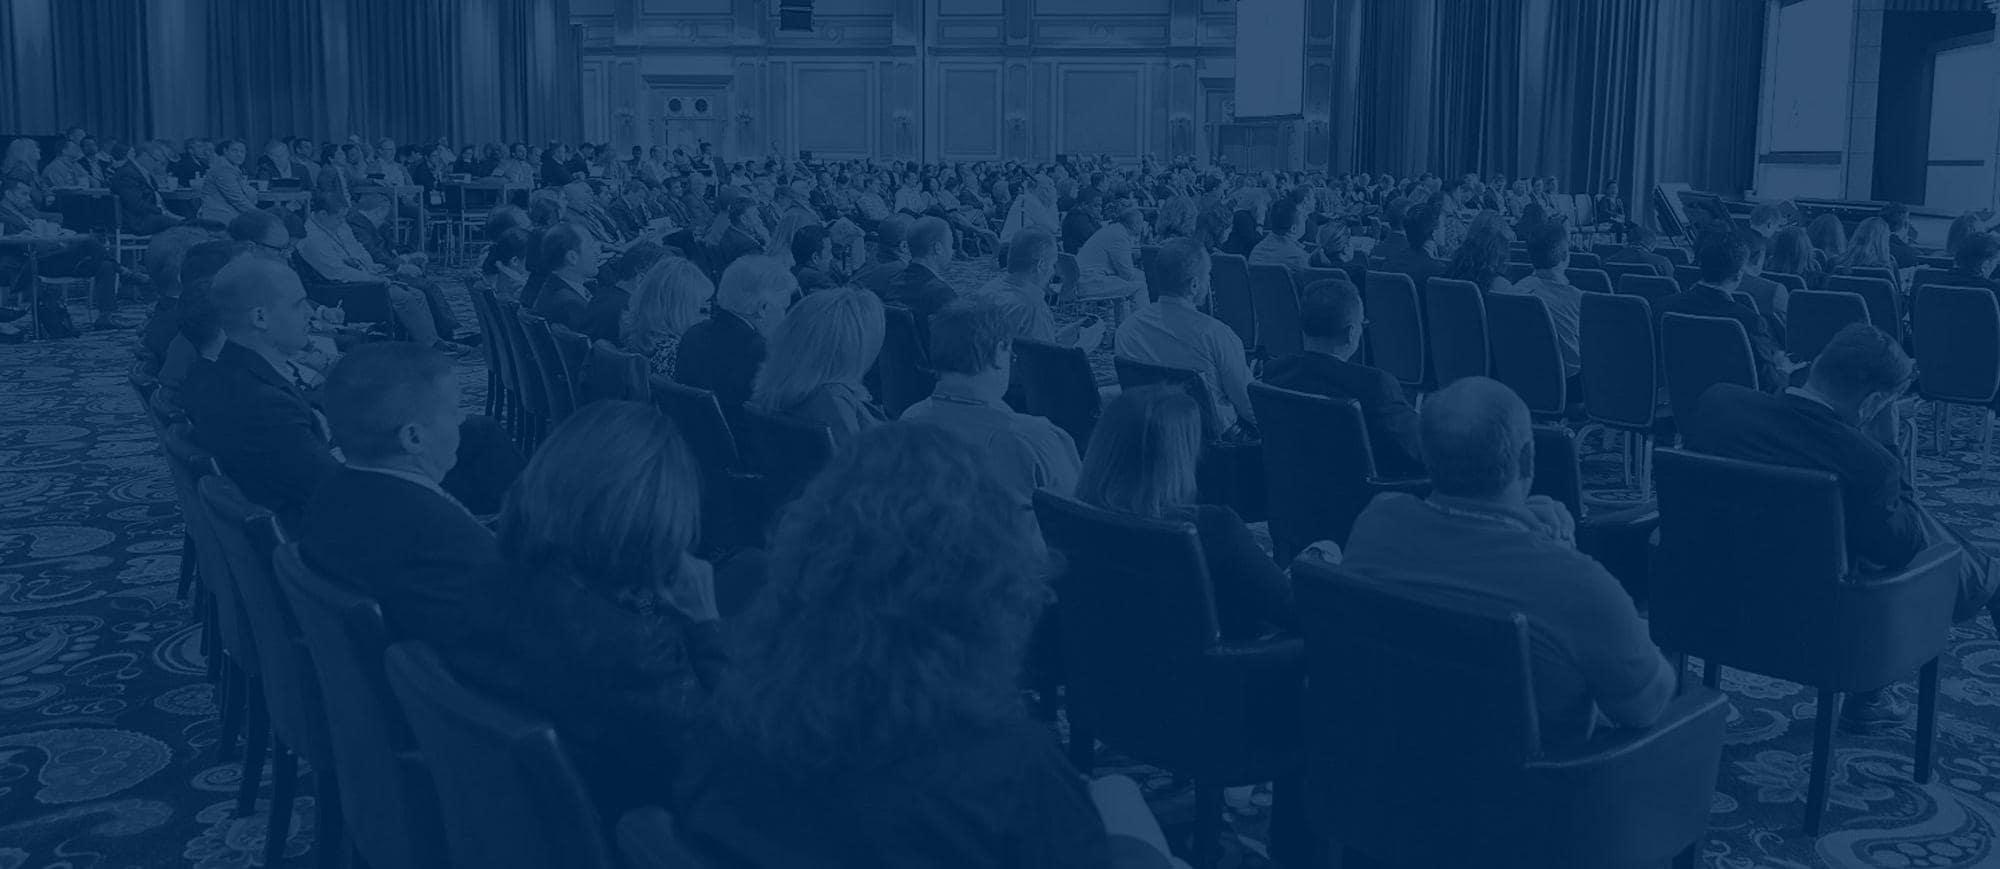 SAS Business Forum 2018 | SAS Finland